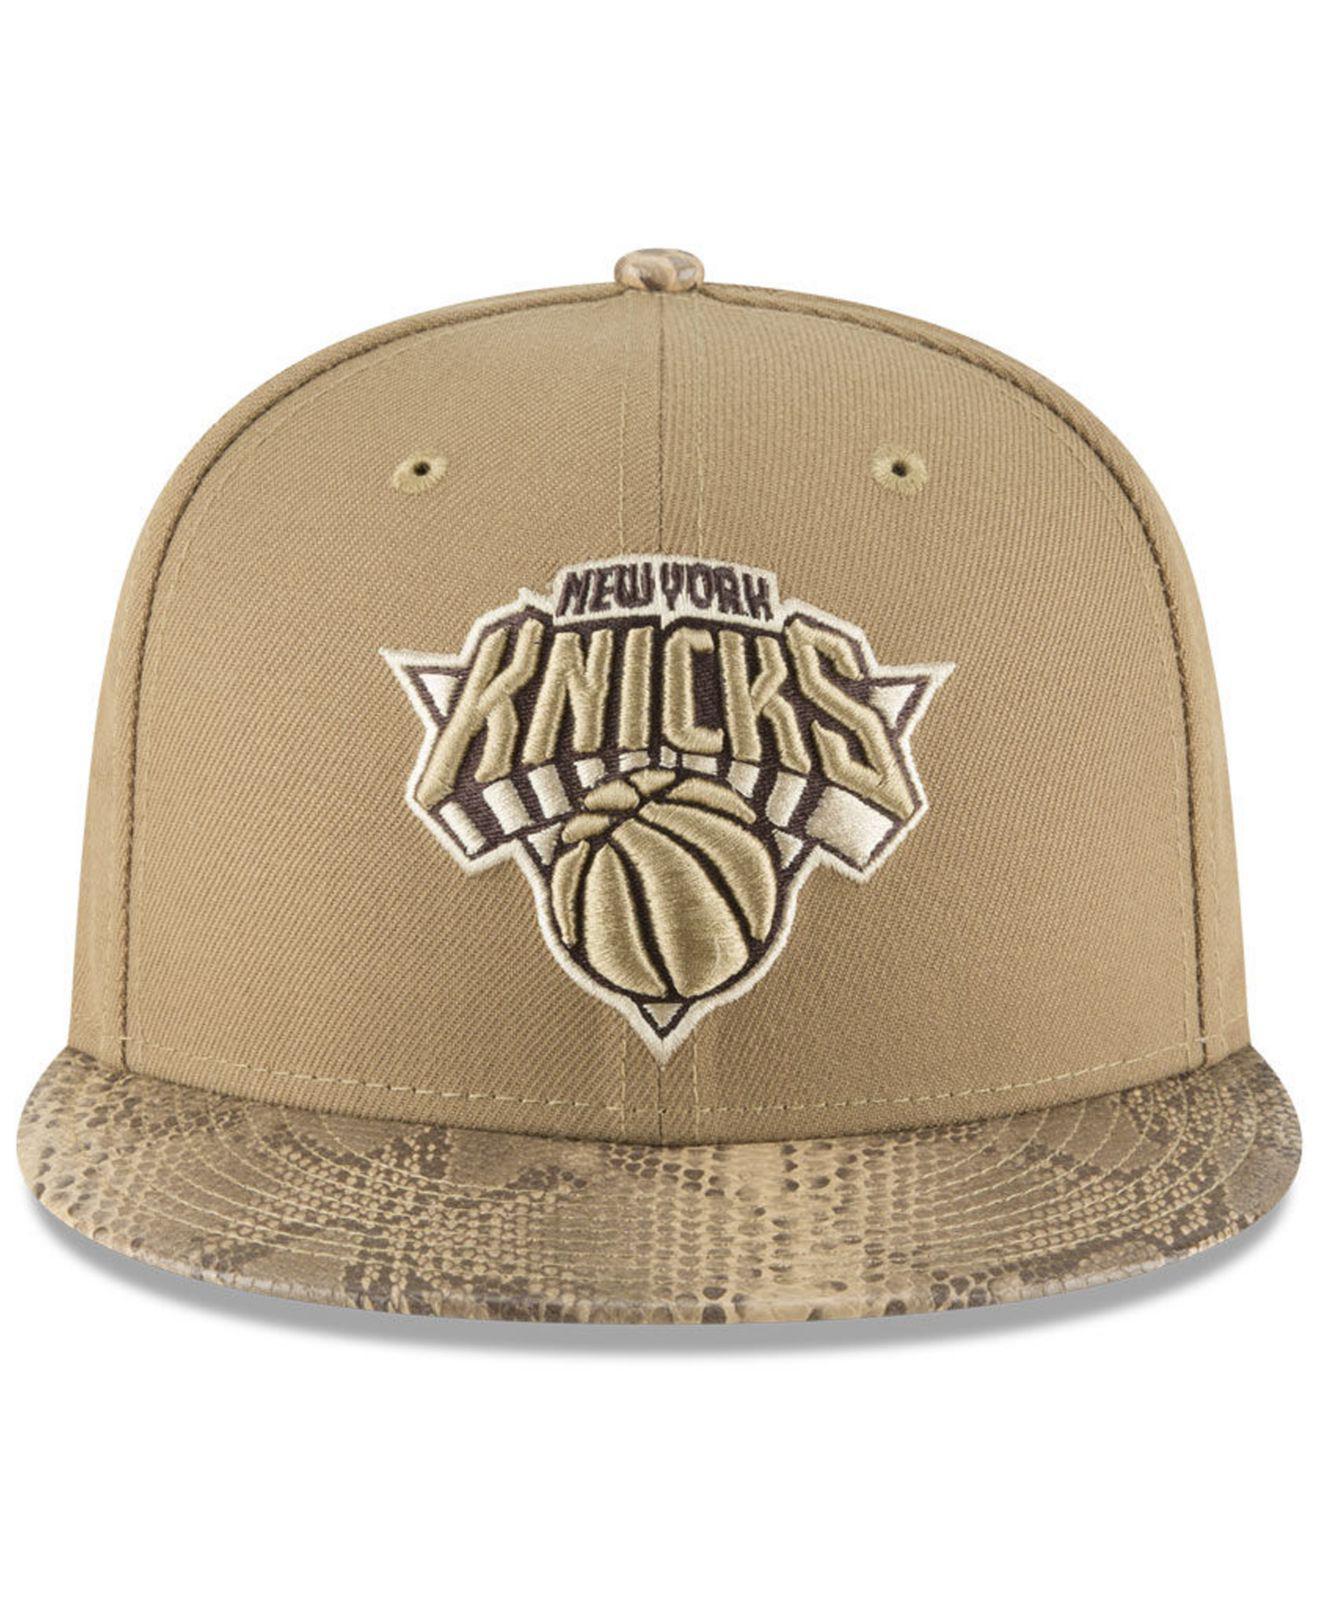 wholesale dealer a635b 61c0a Lyst - KTZ New York Knicks Snakeskin Sleek 59fifty Fitted Cap for Men